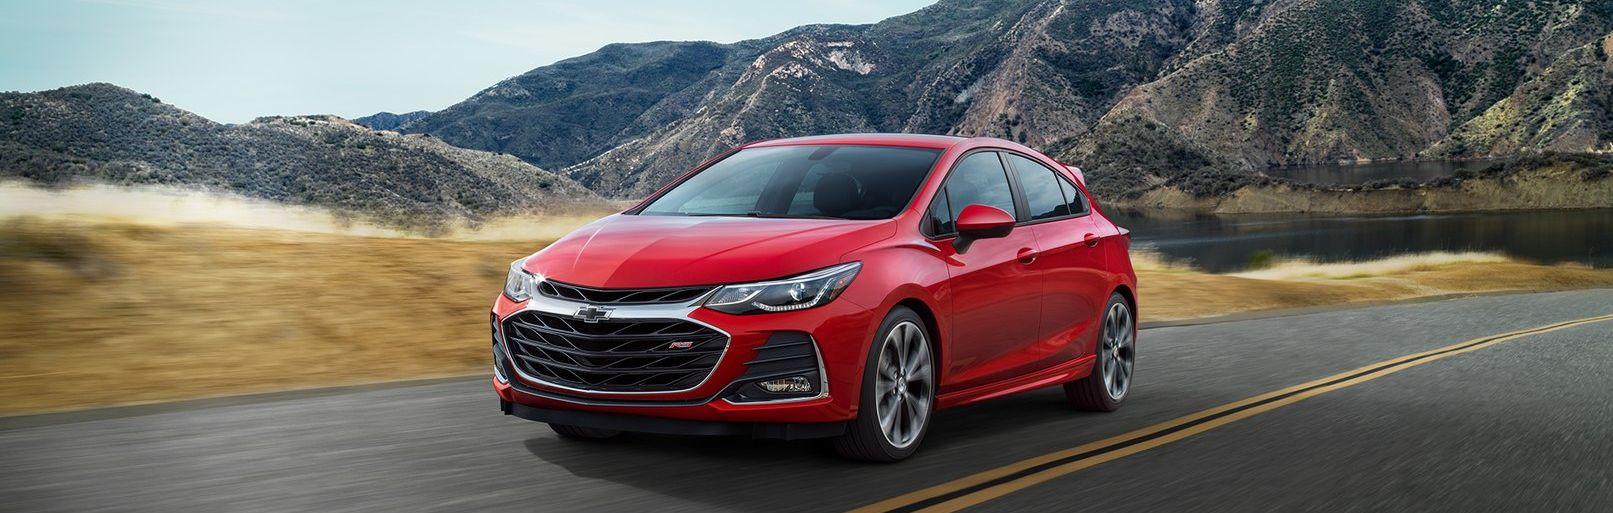 2019 Chevrolet Cruze Leasing near Manassas, VA